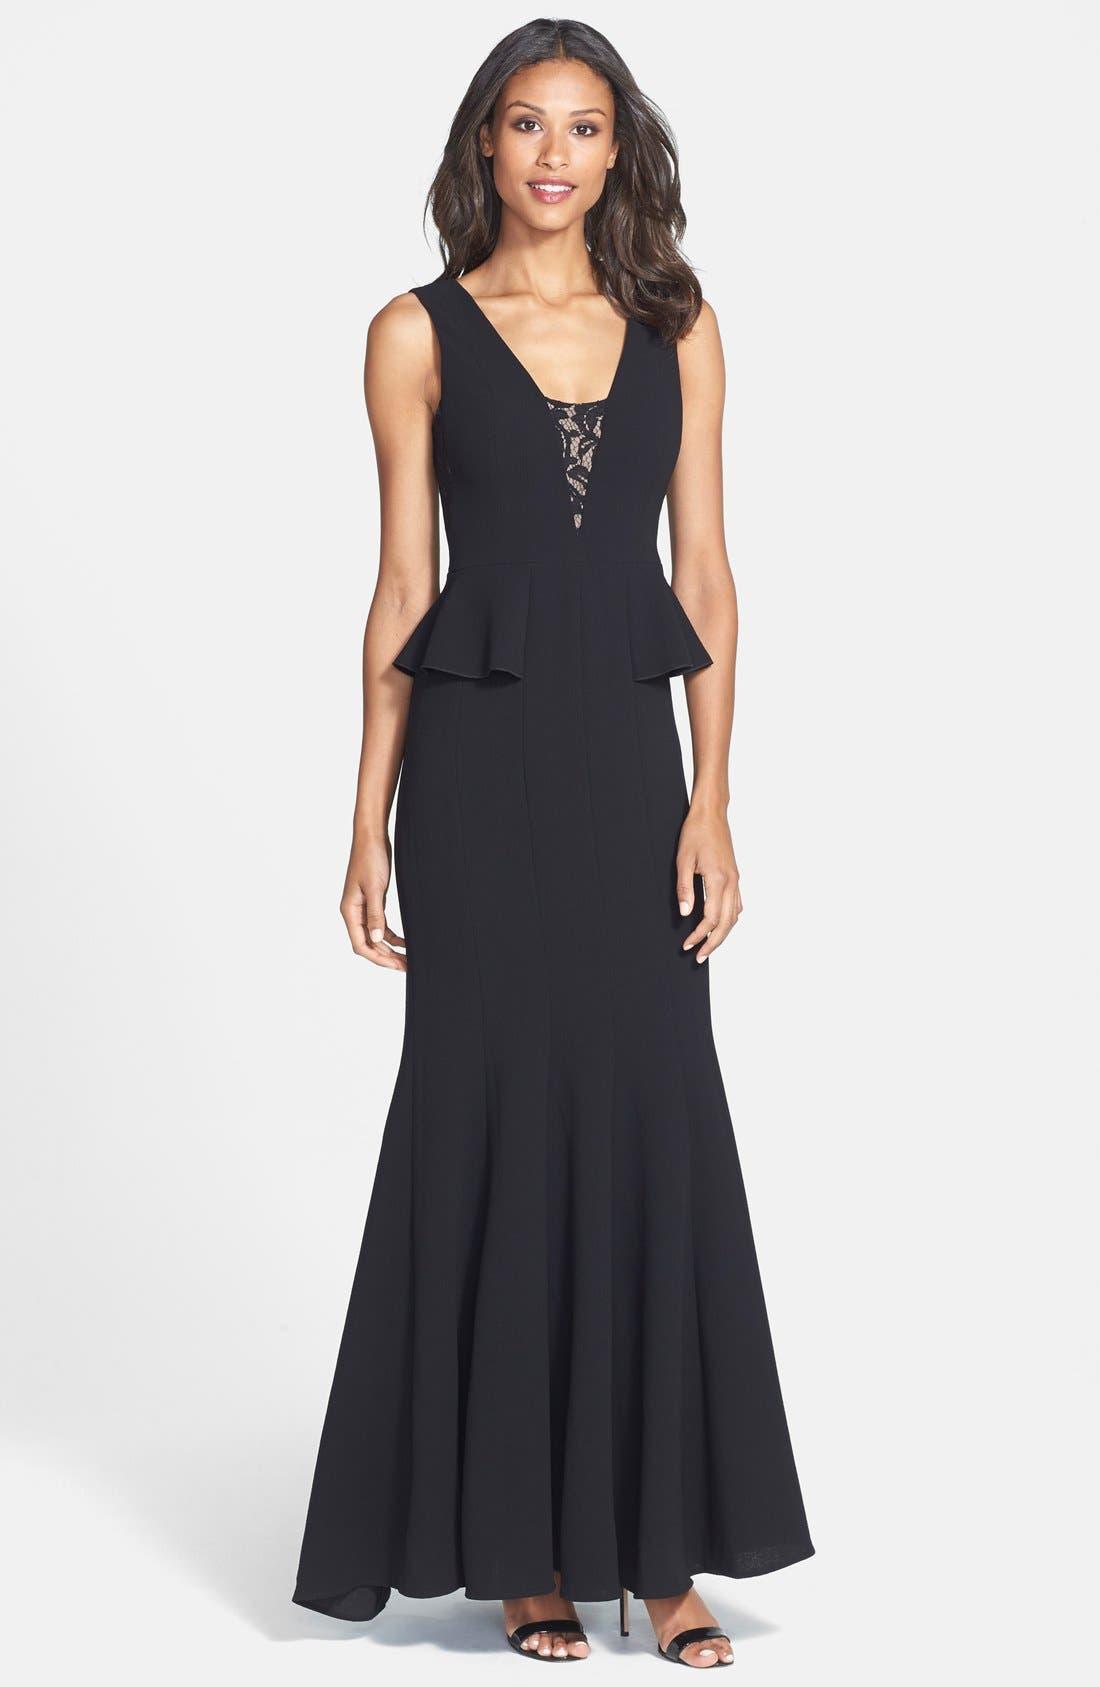 Alternate Image 1 Selected - BCBGMAXAZRIA 'Silva' Lace Inset Crepe Peplum Gown